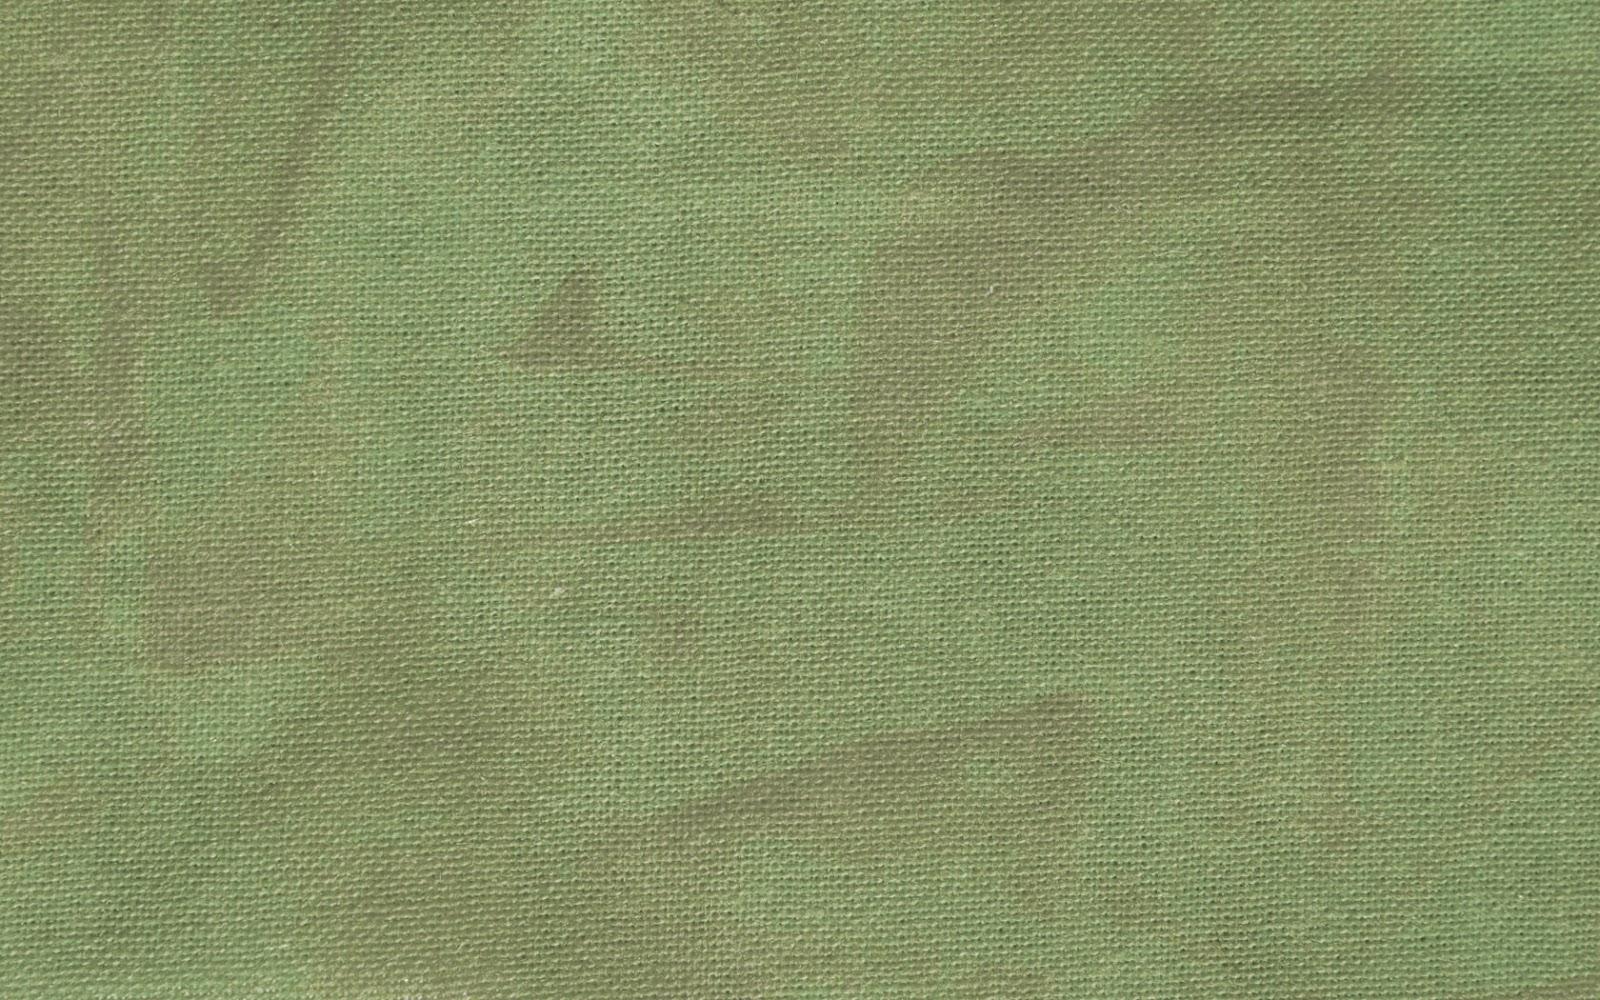 Plain wallpaper background wallpapersafari - Plain green background ...